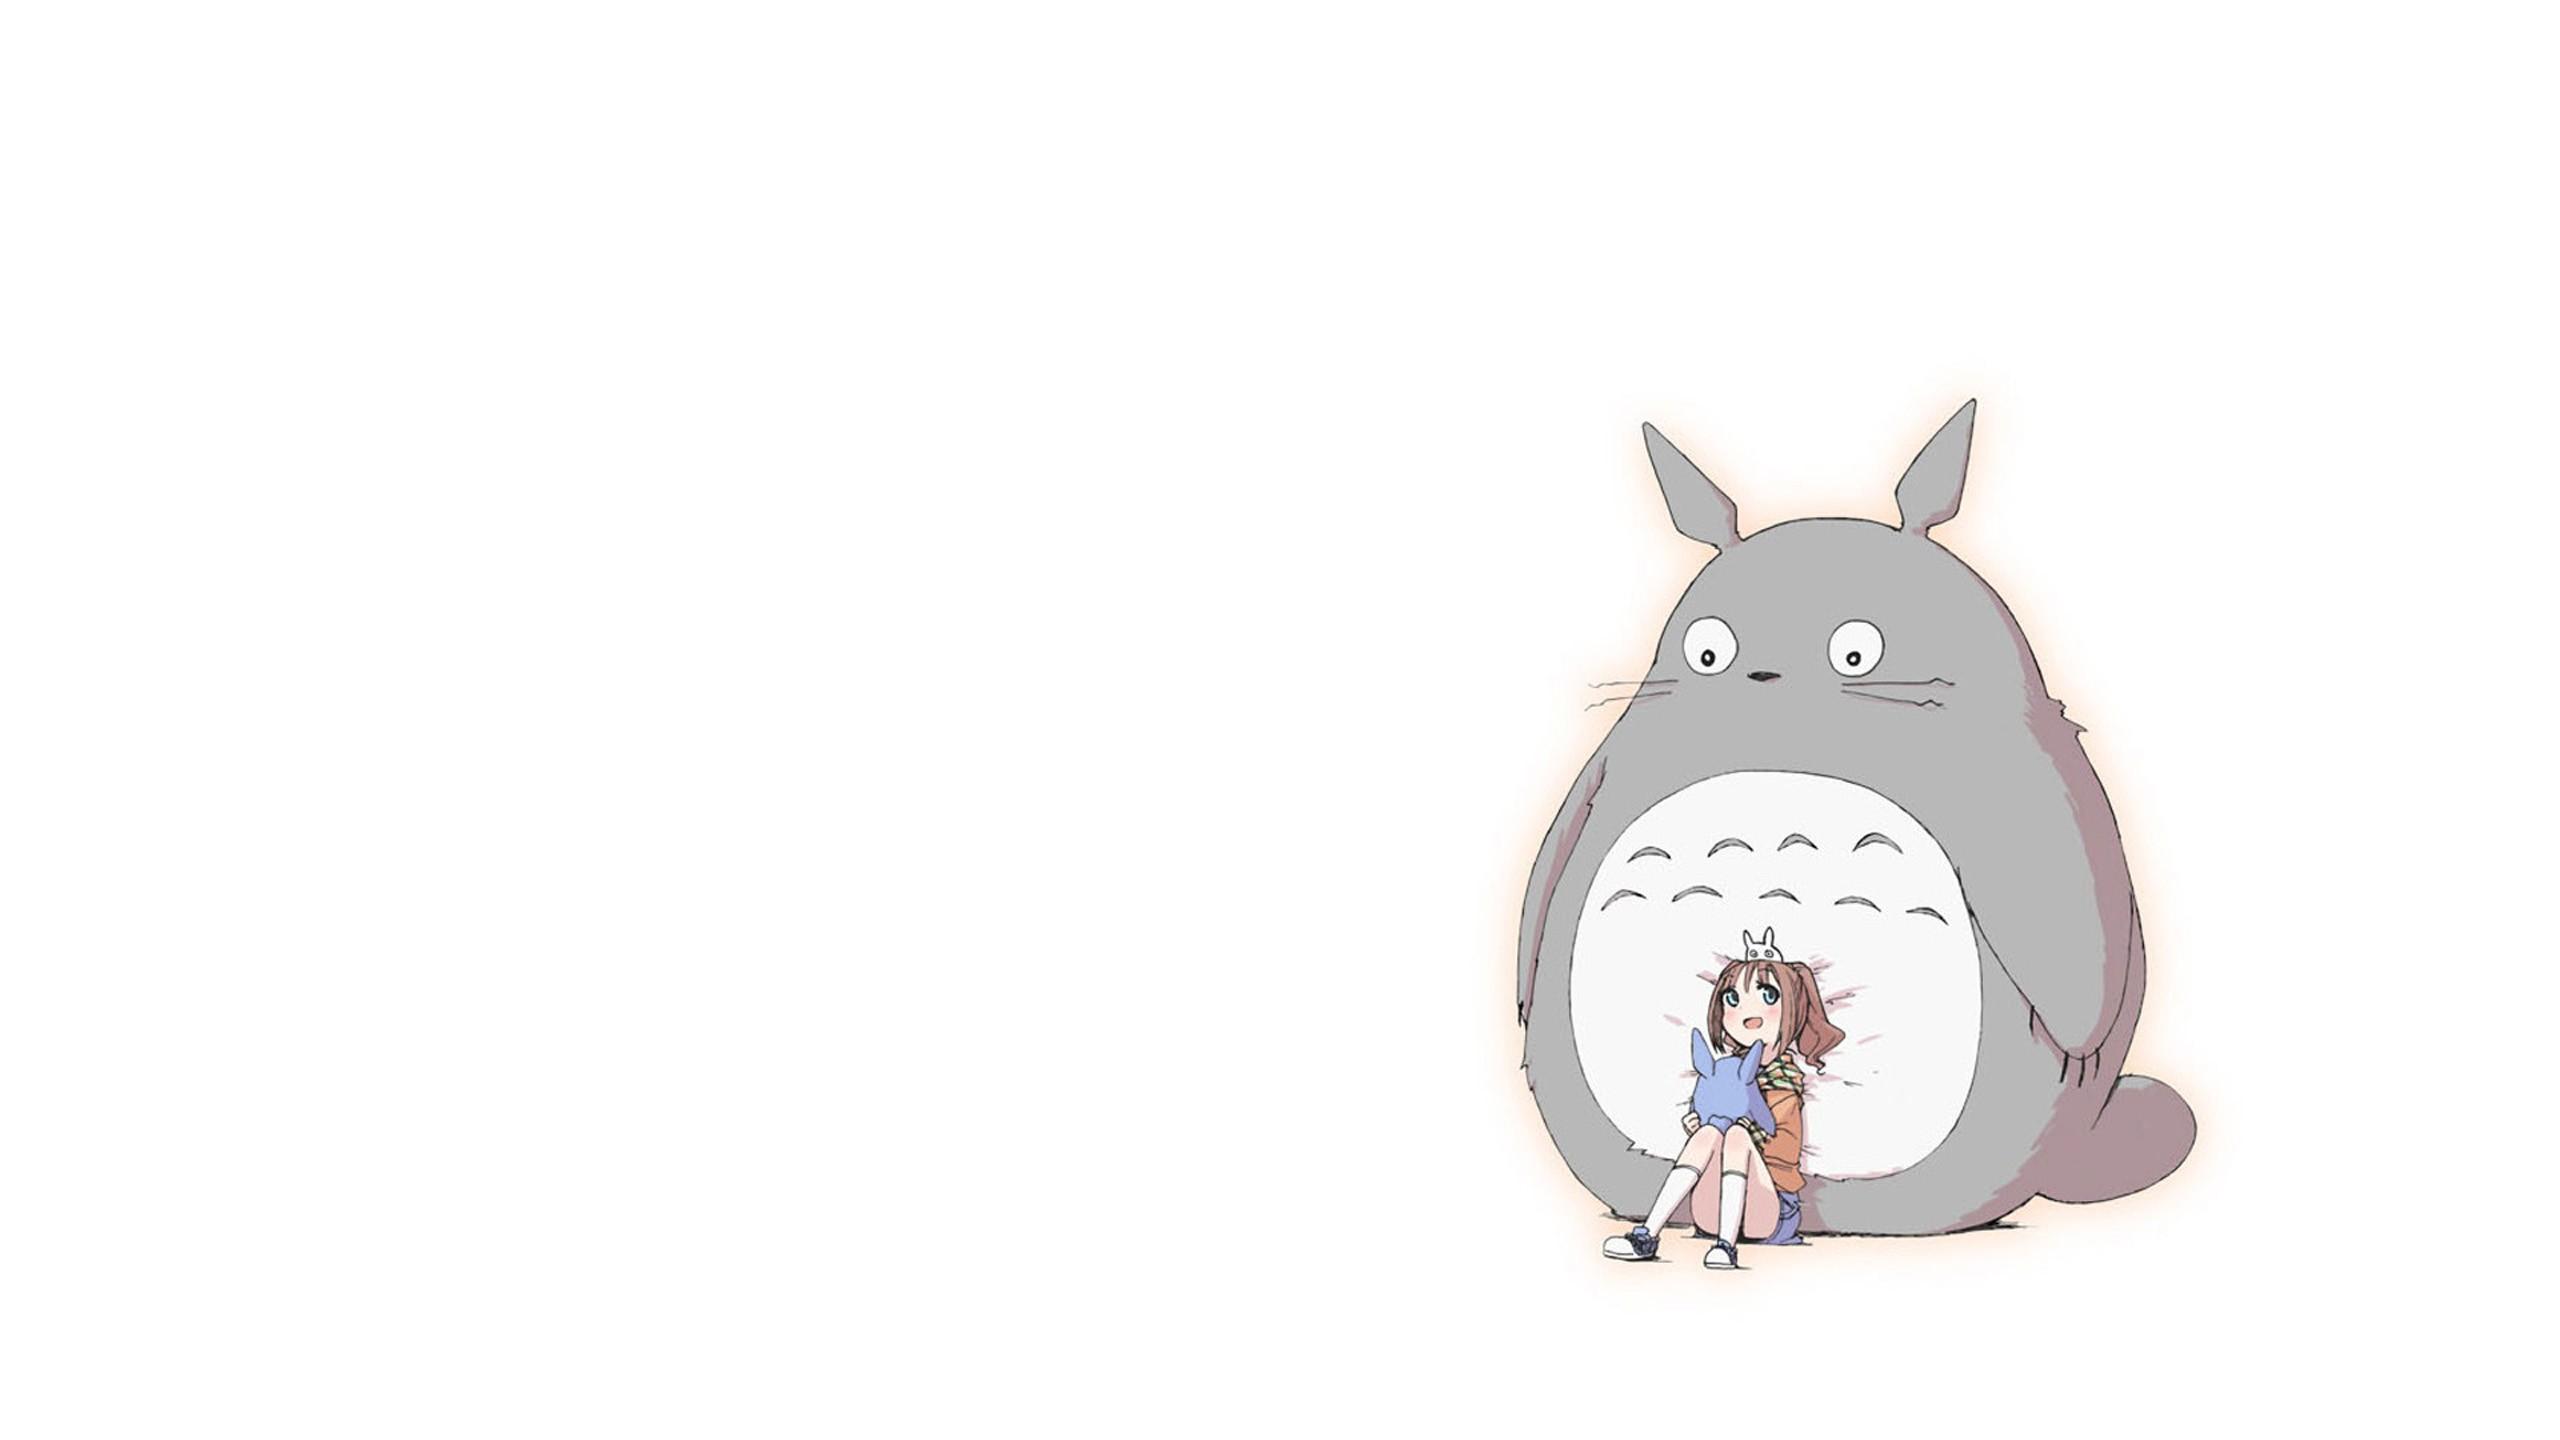 Totoro wallpaper ·① Download free stunning full HD ...